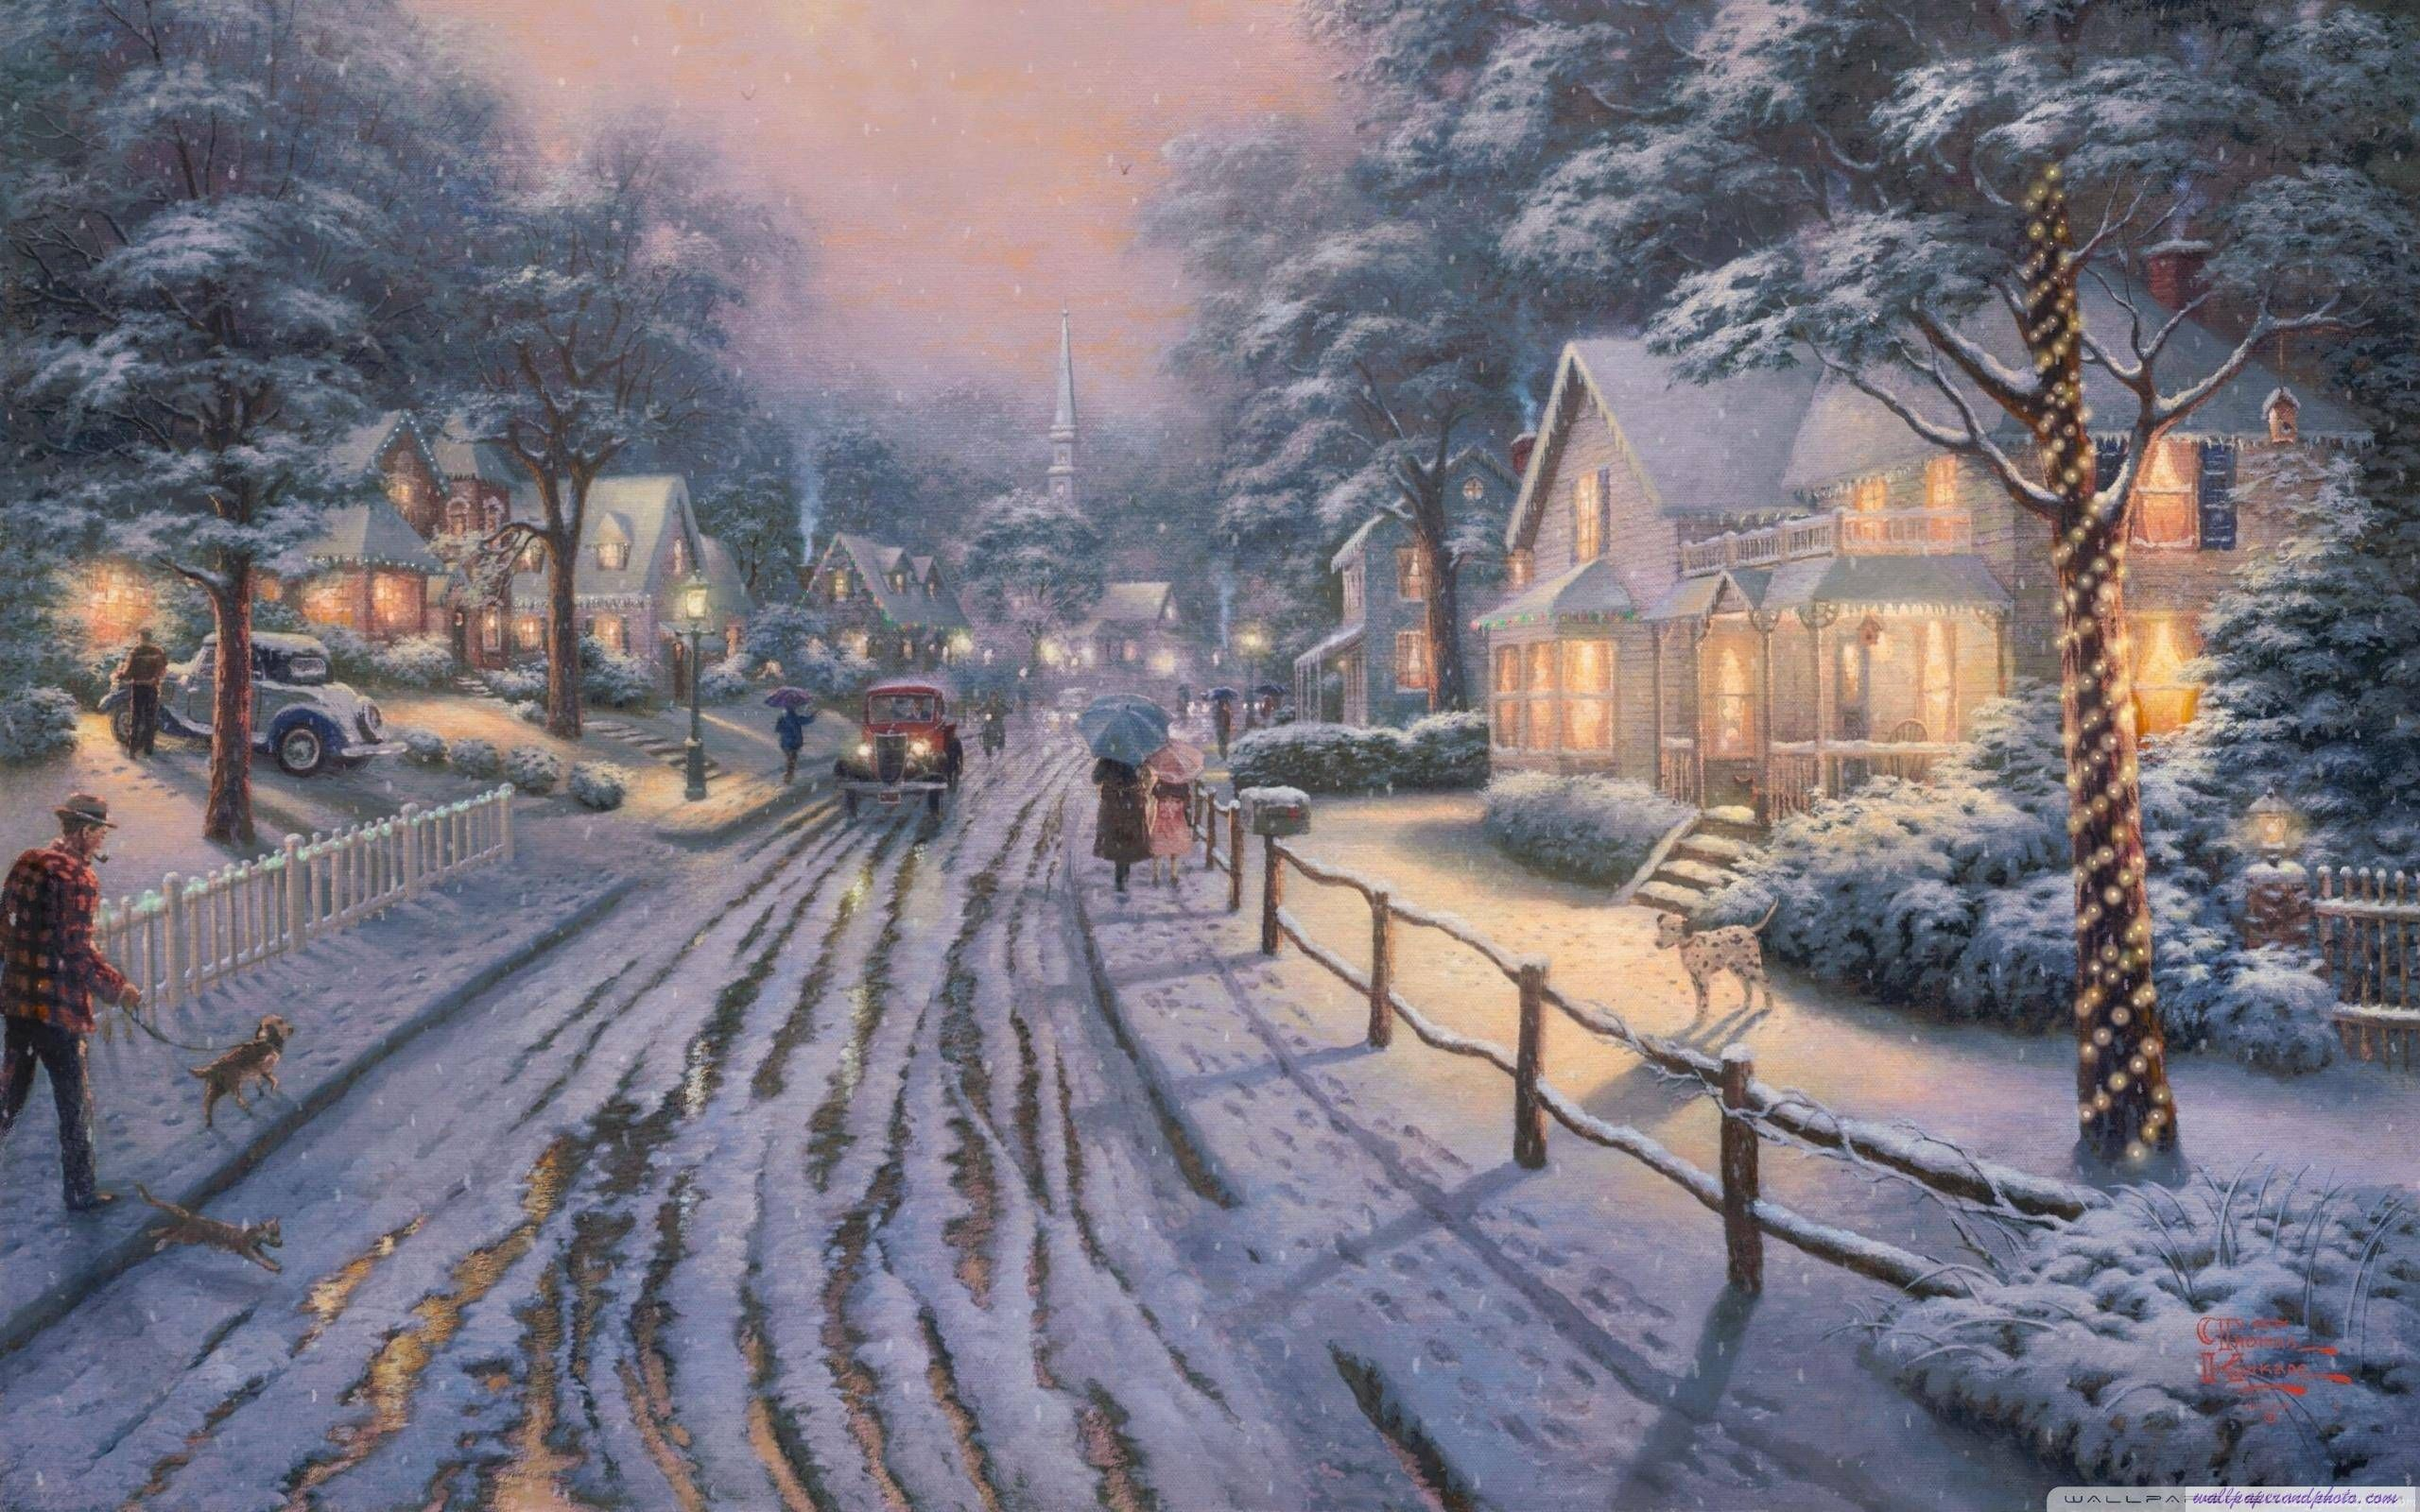 Hometown Christmas Memories by Thomas Kinkade HD 16 9 16 10 desktop